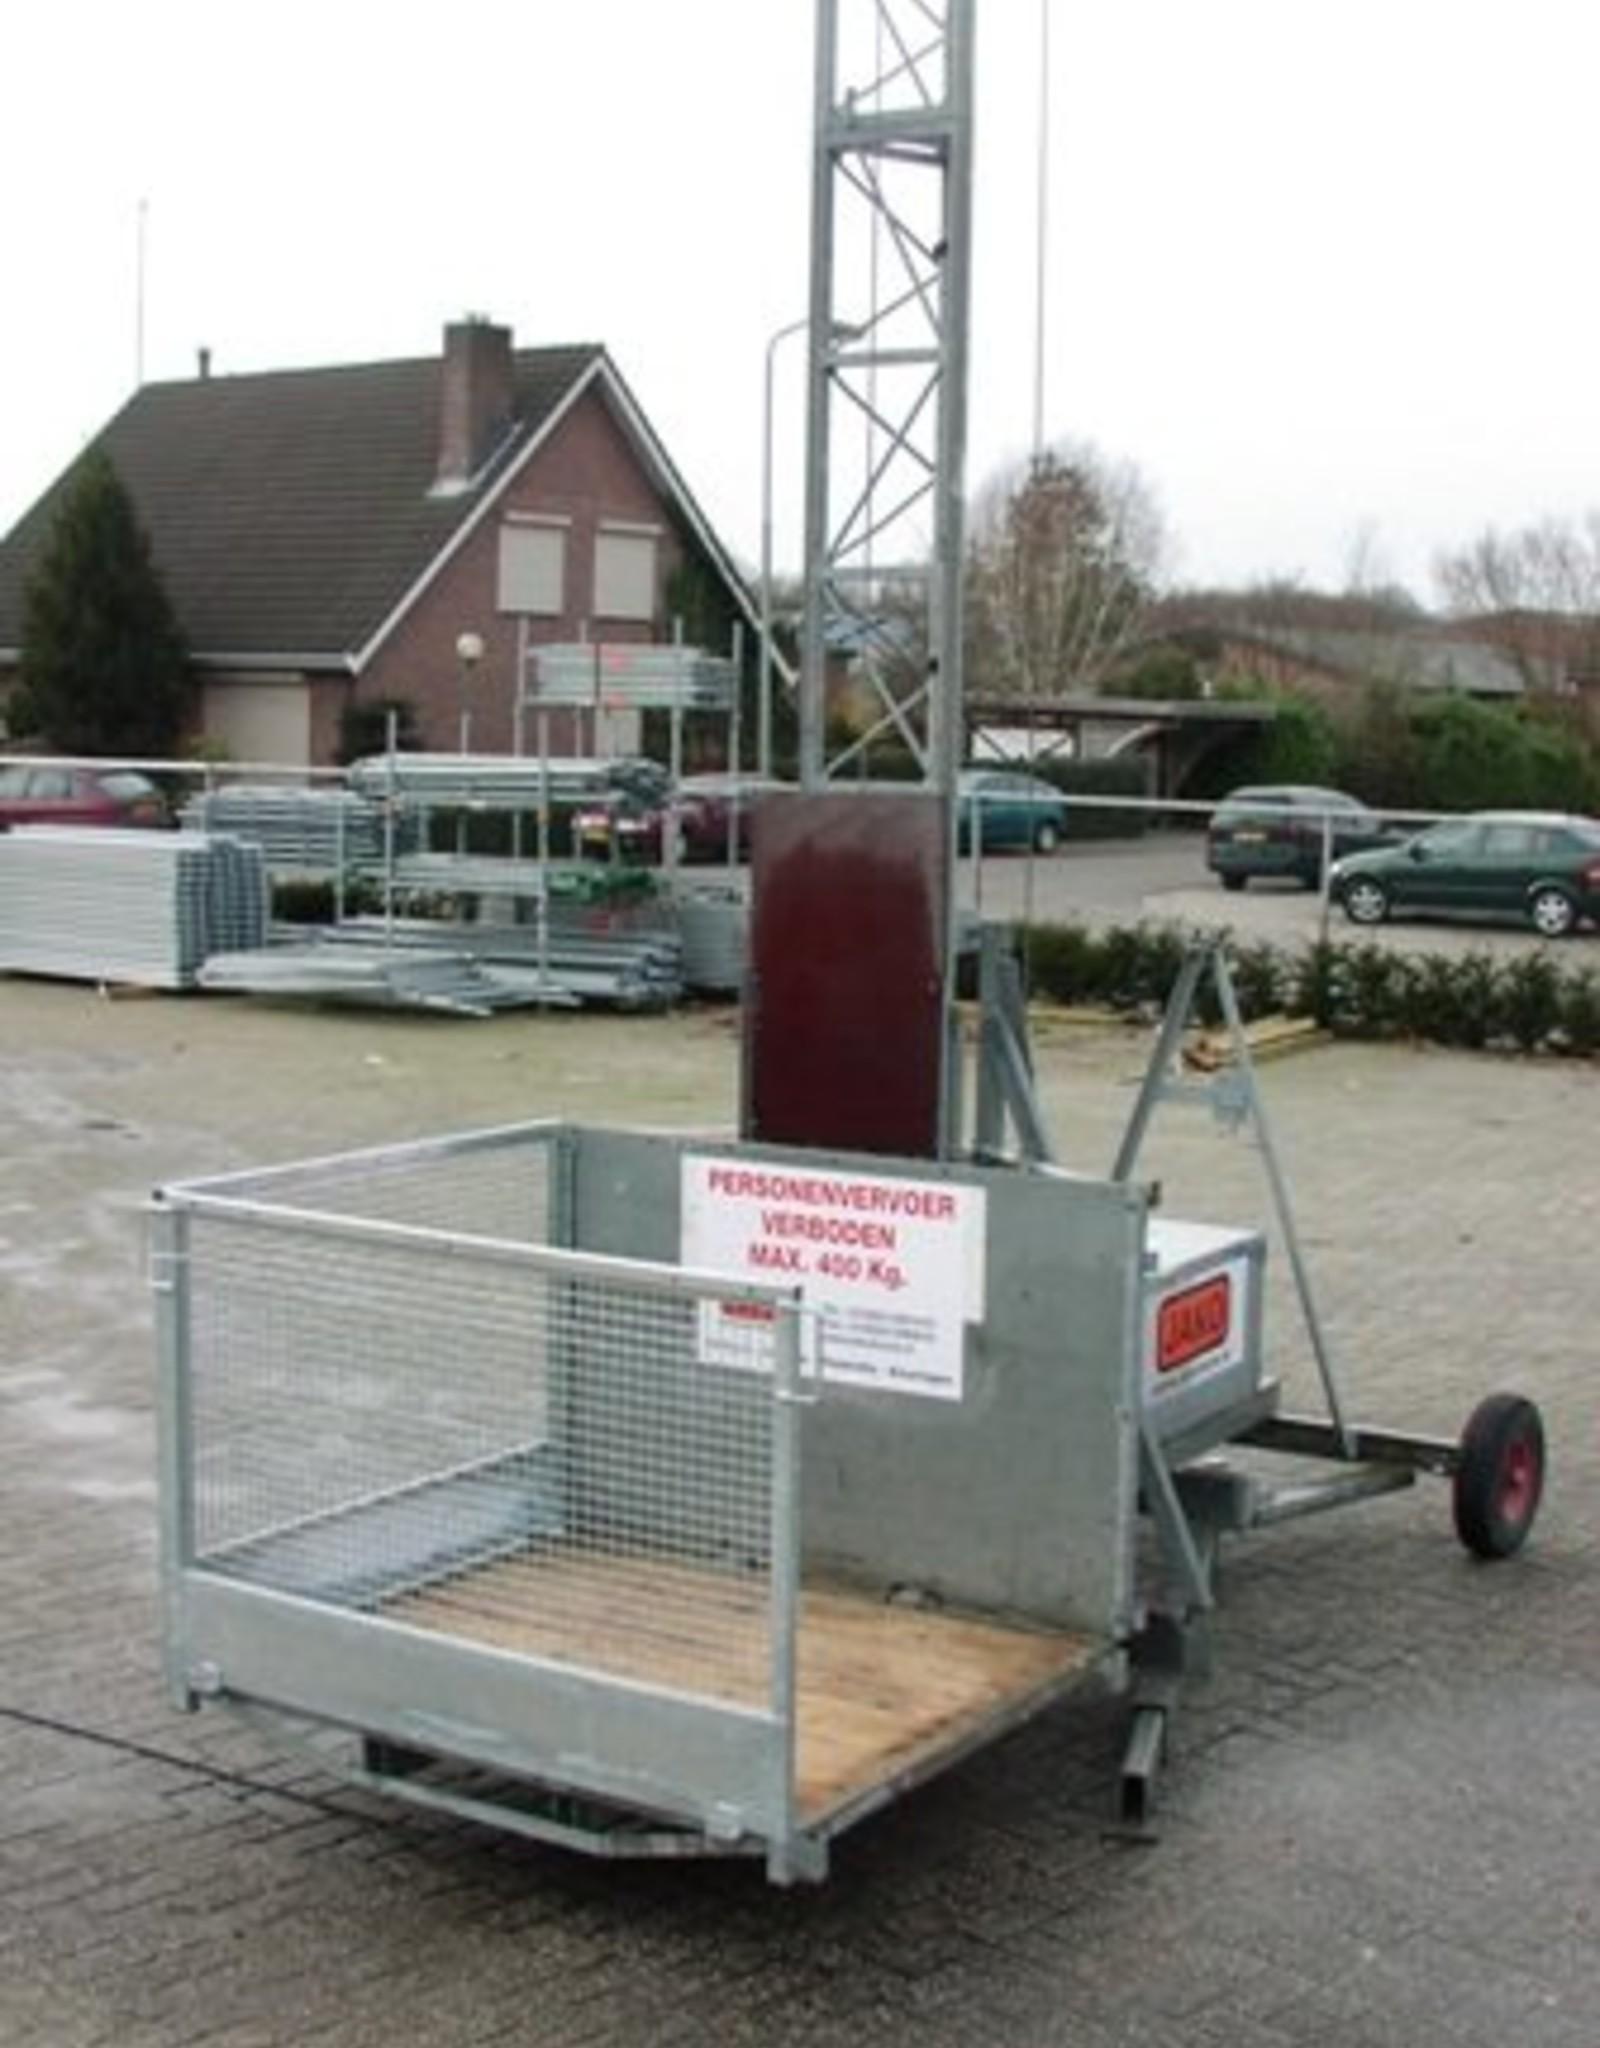 HEK A40 Goederenlift